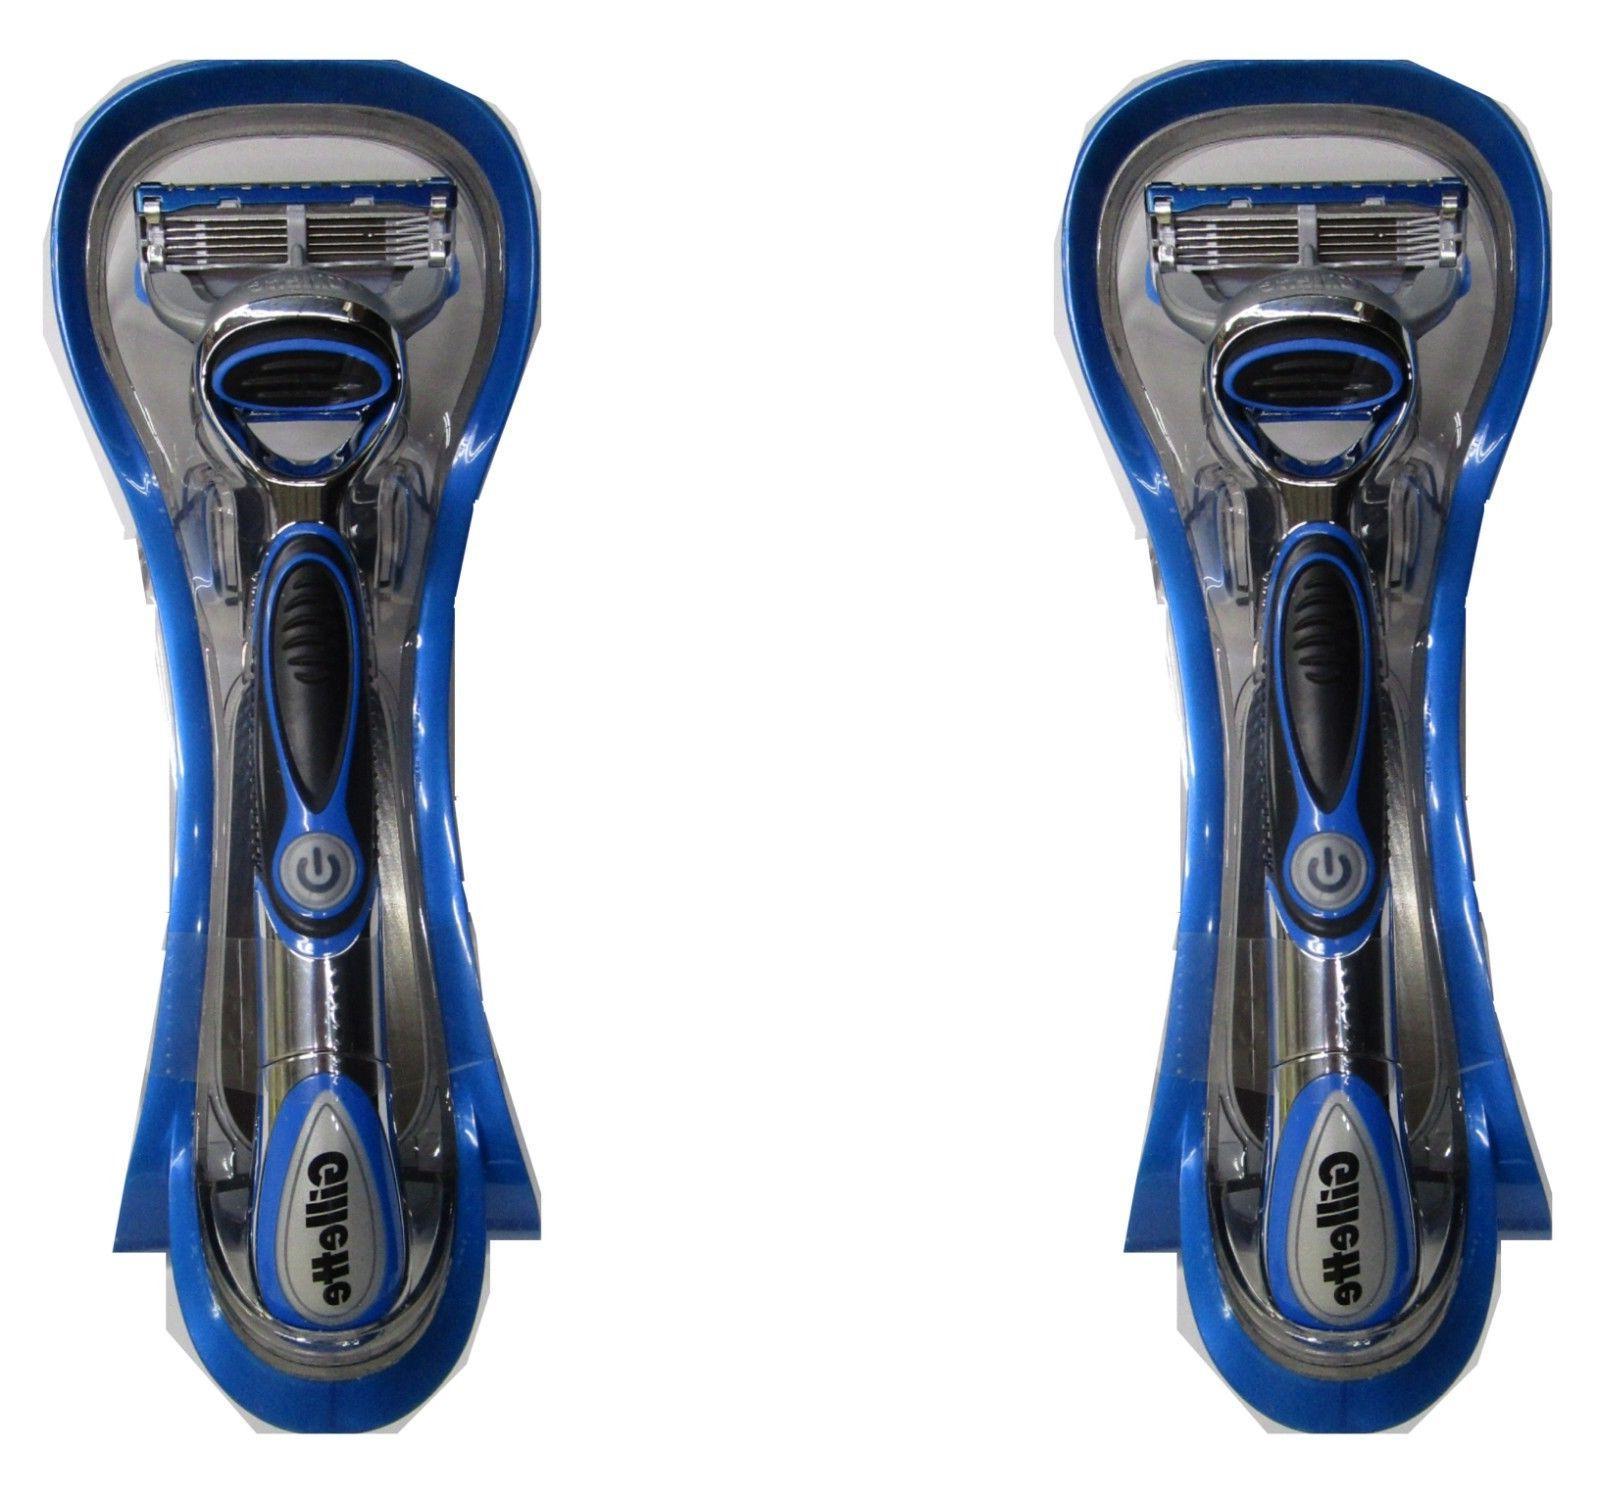 power proglide razor blades 2 count bulk